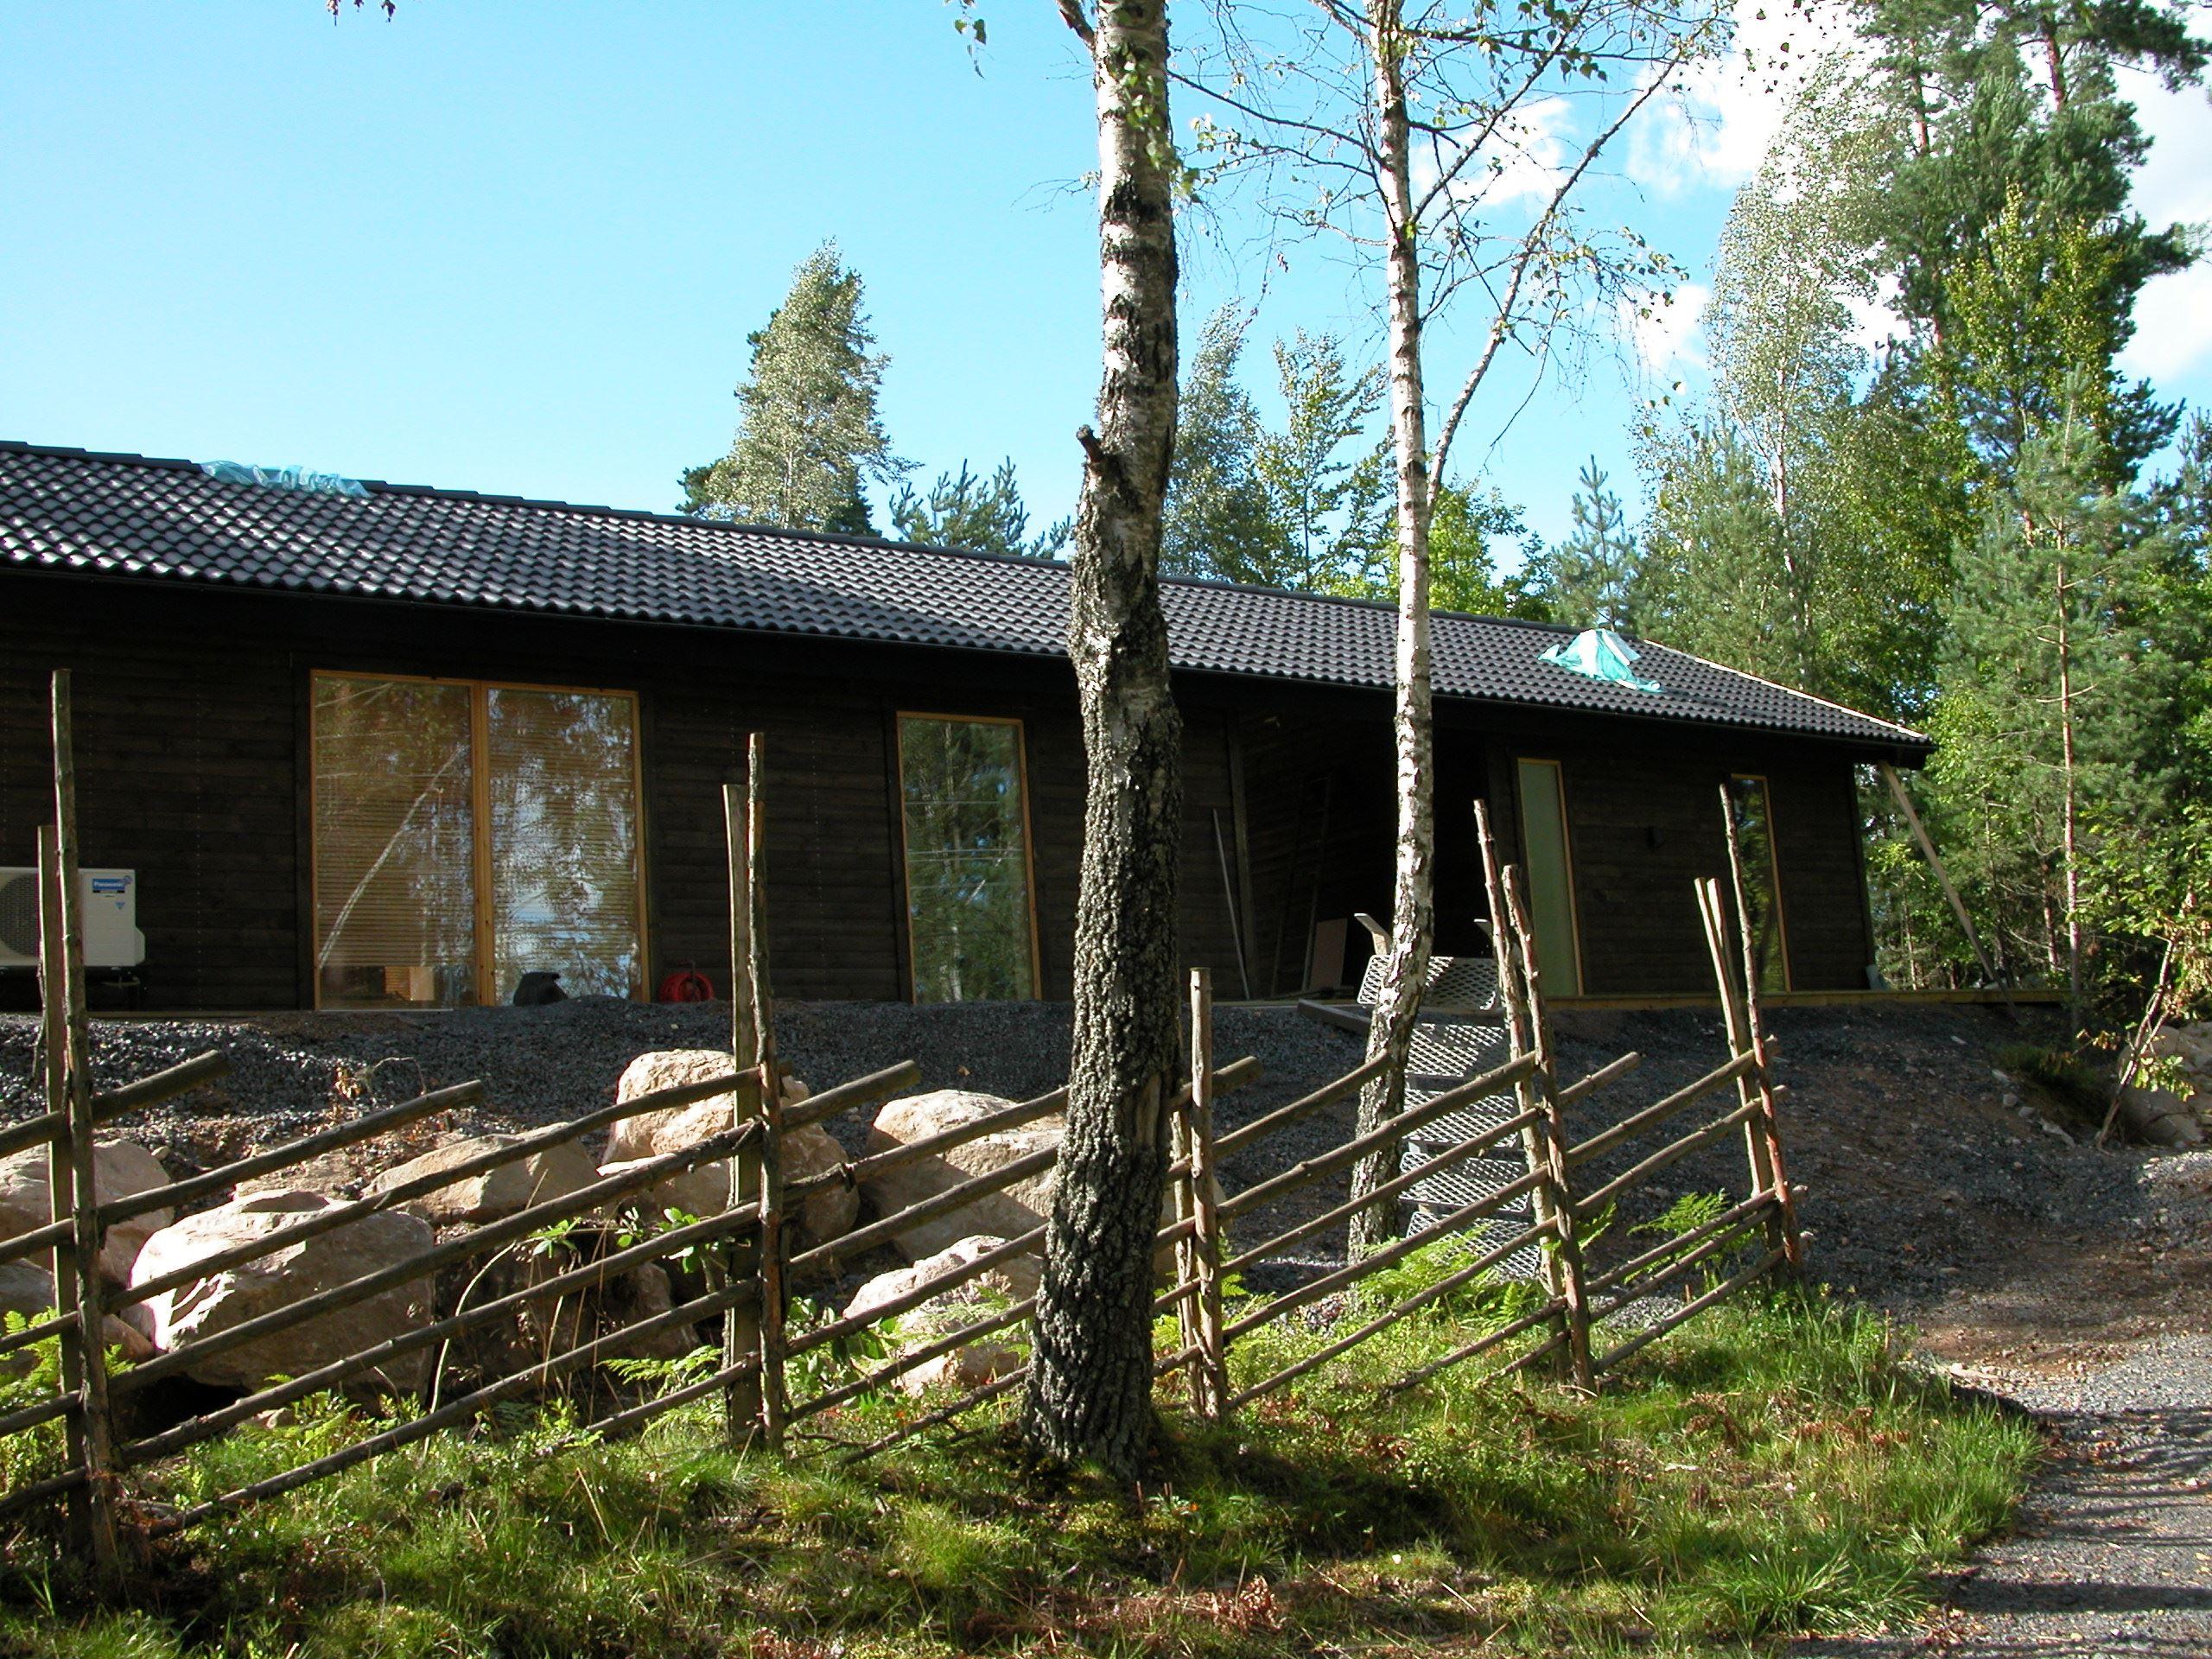 Cottage 27 - Smörahålan - SmålandVip Ove Varland